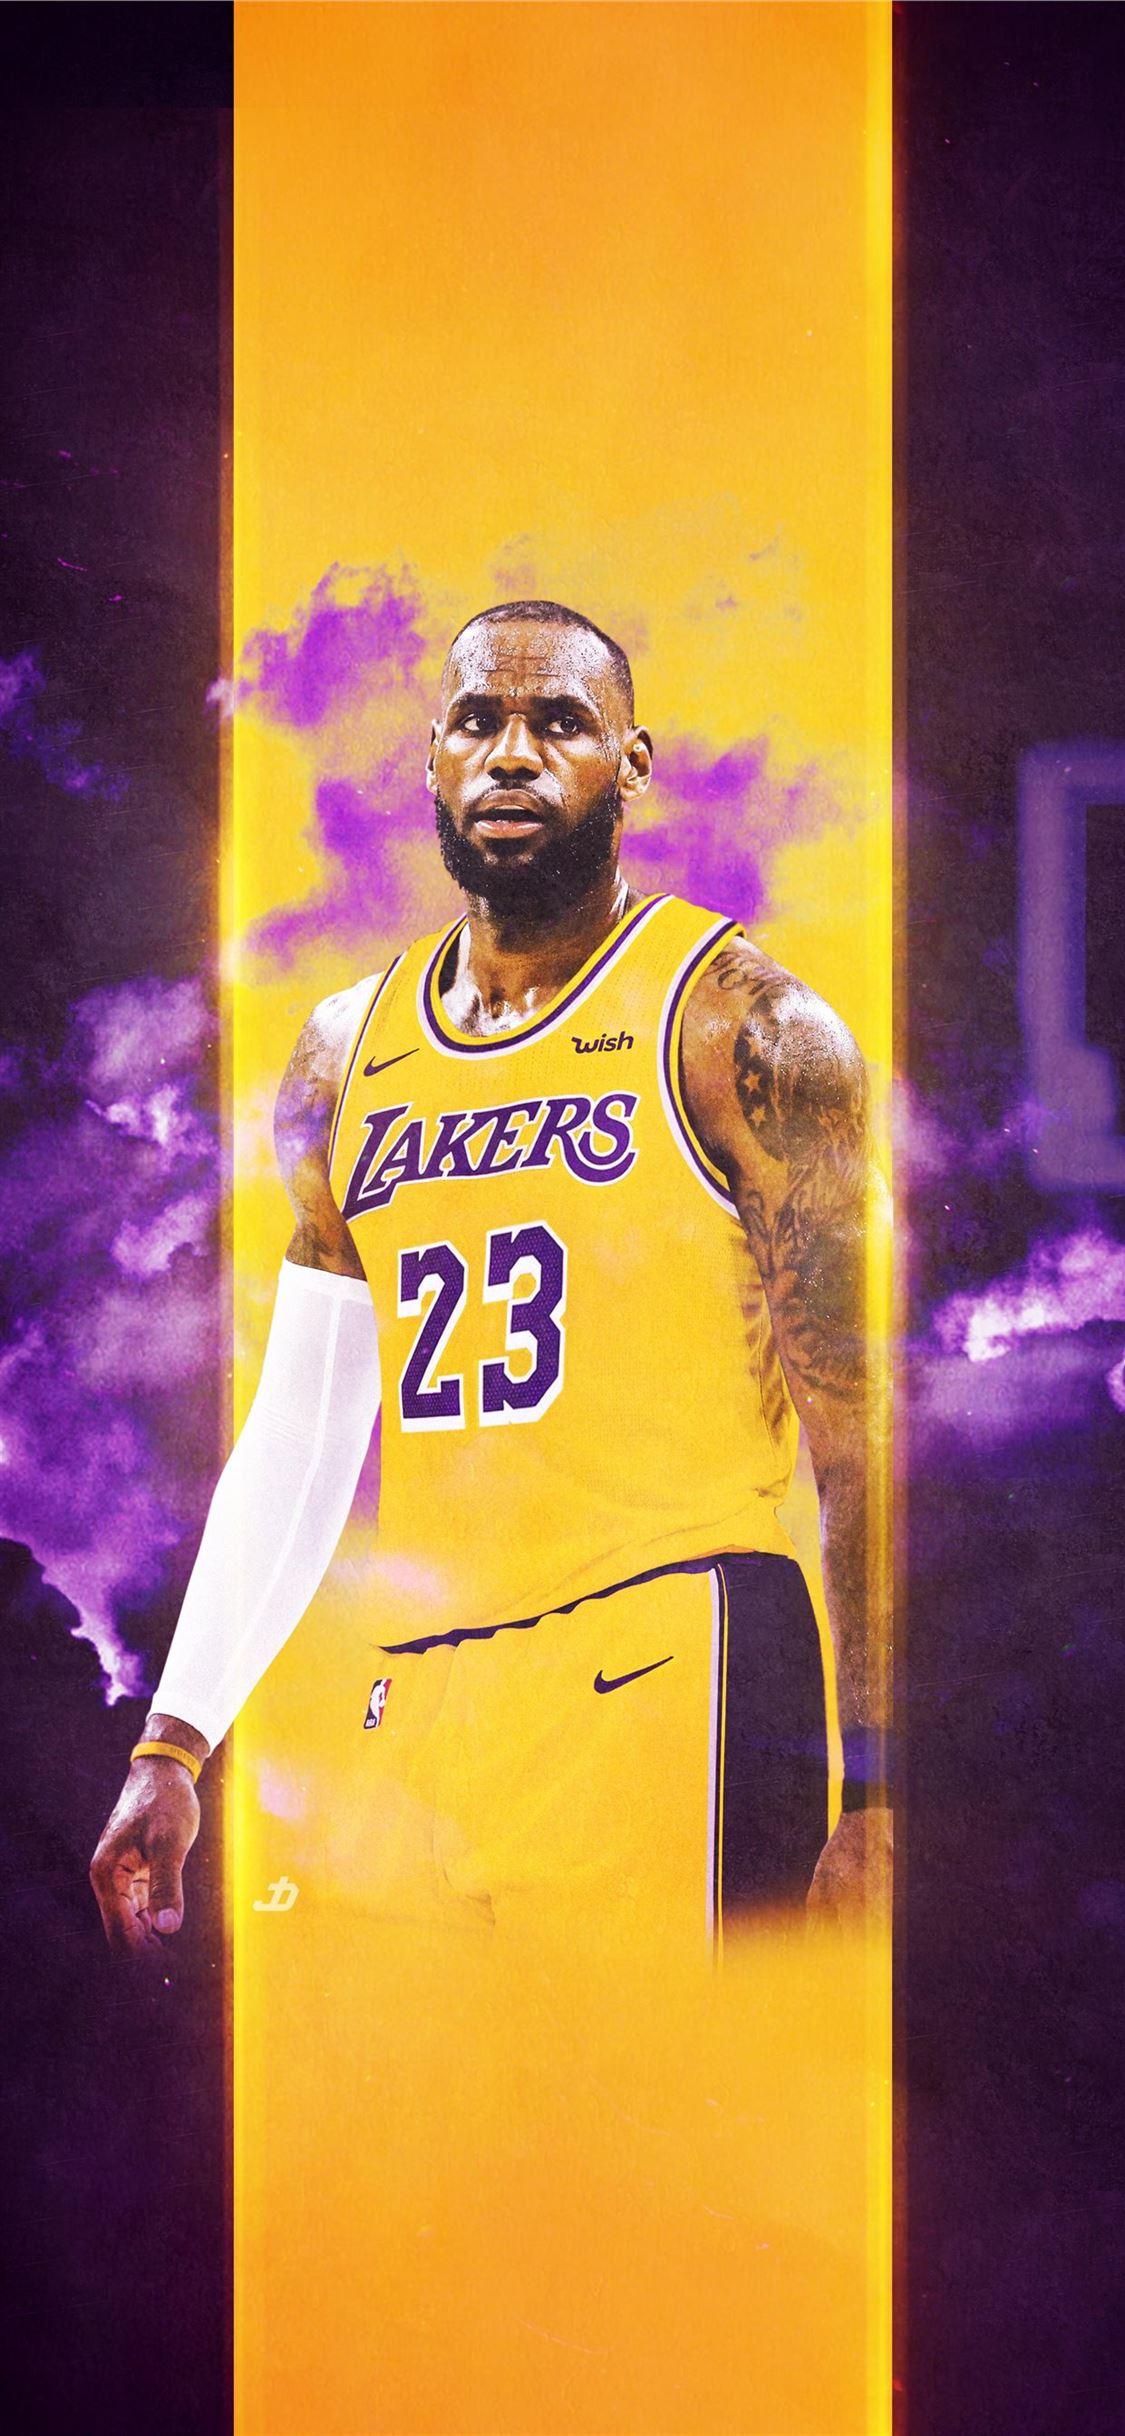 Lebron James Wallpaper Lakers 2861598 Hd Wallpaper Backgrounds Download